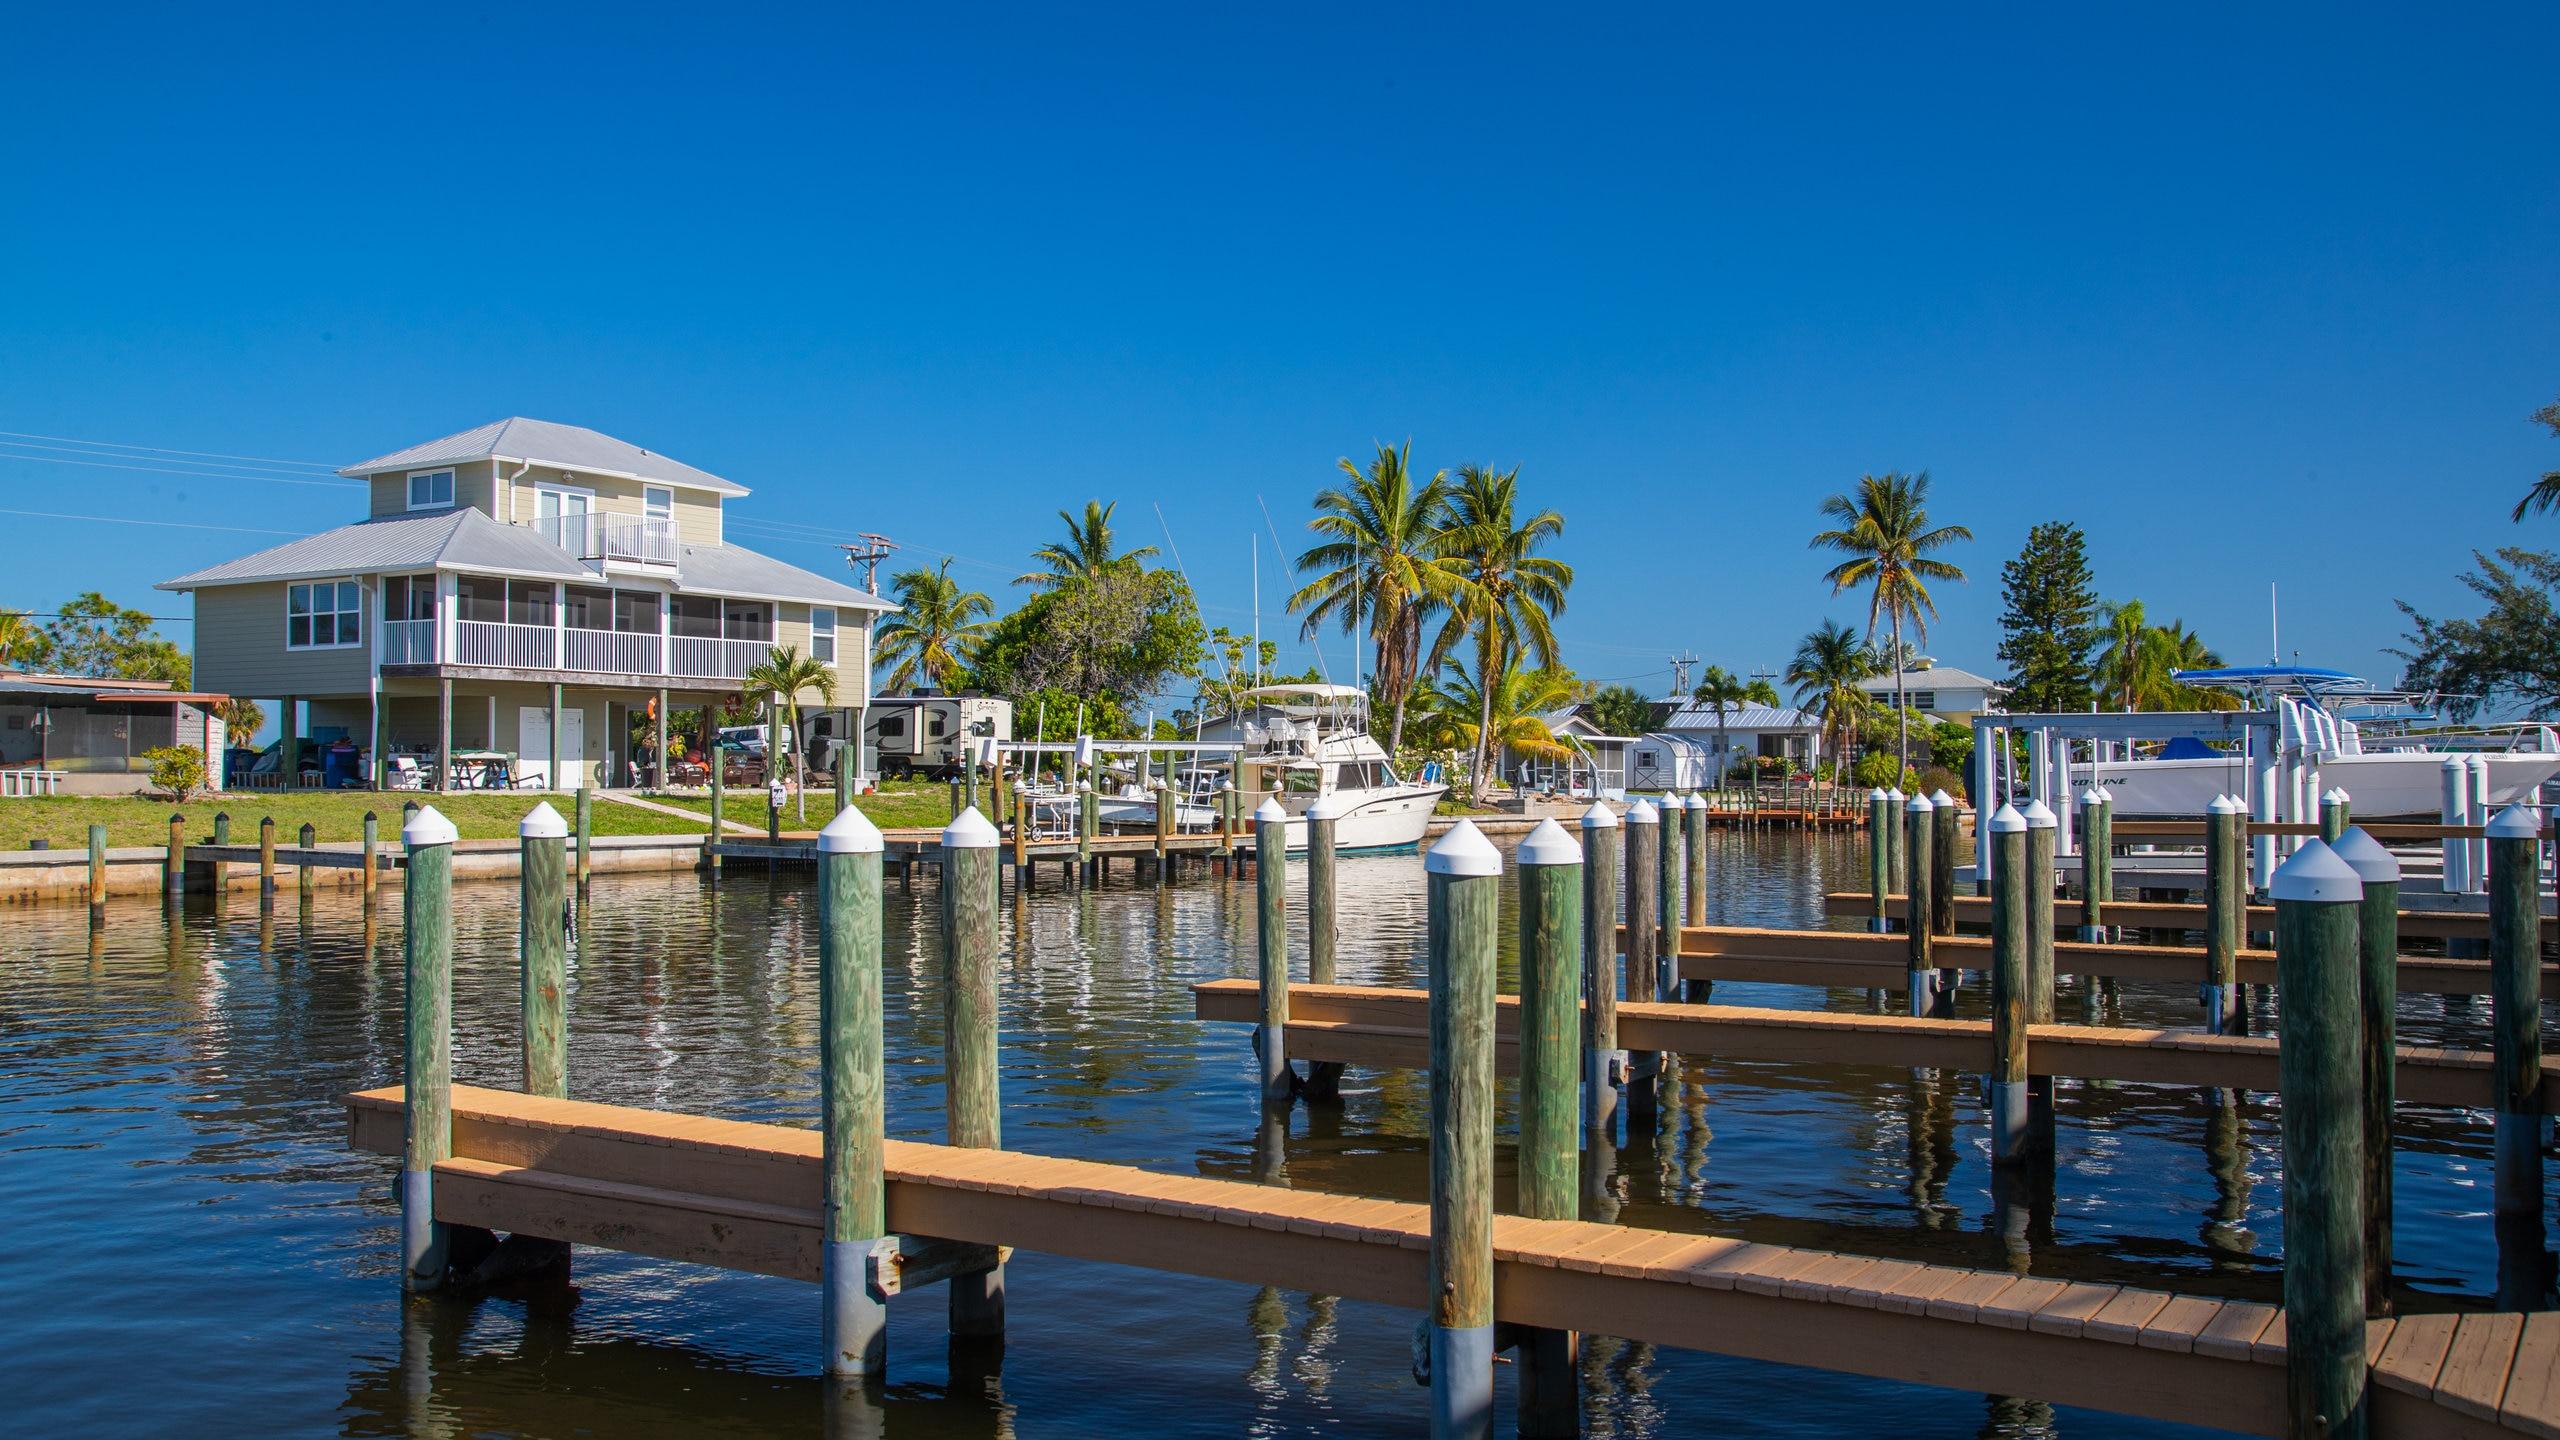 Saint James City, Florida, United States of America